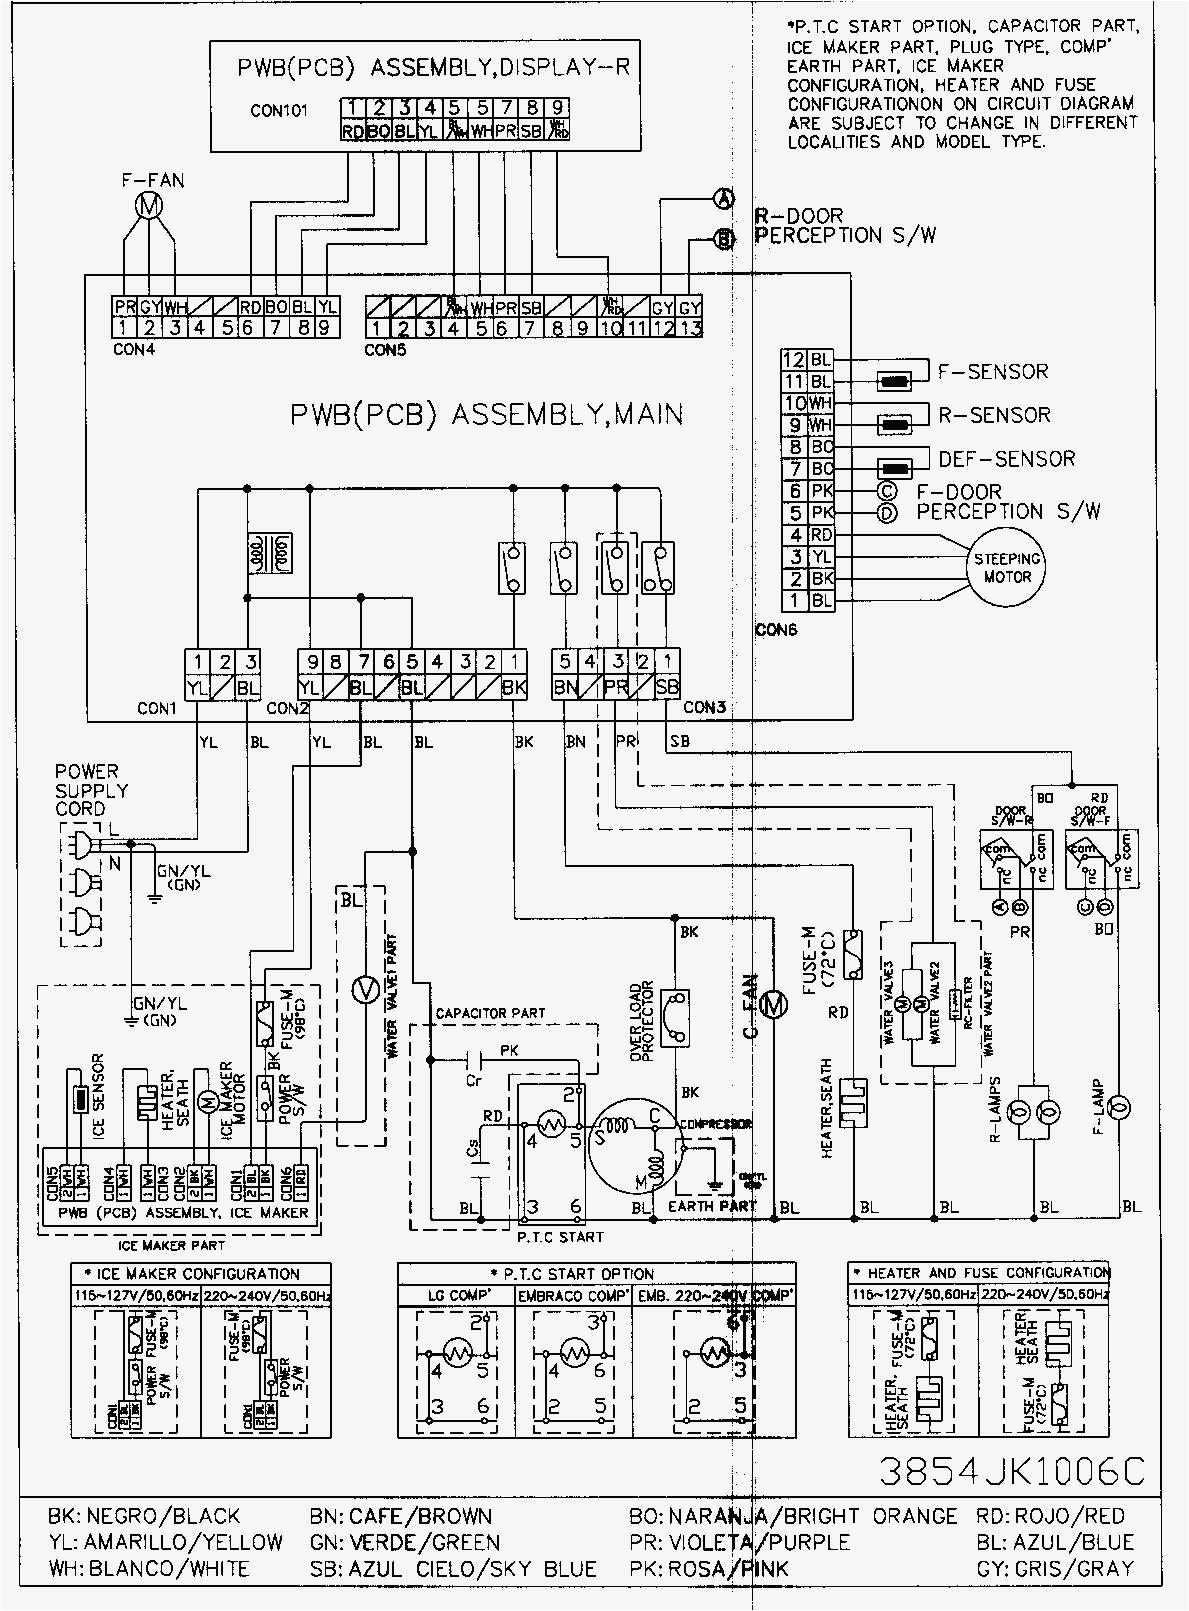 Whirlpool Ice Maker Wiring Diagram Maker Wiring Ice Diagram Whirlpool Es4123622 Wiring Diagram